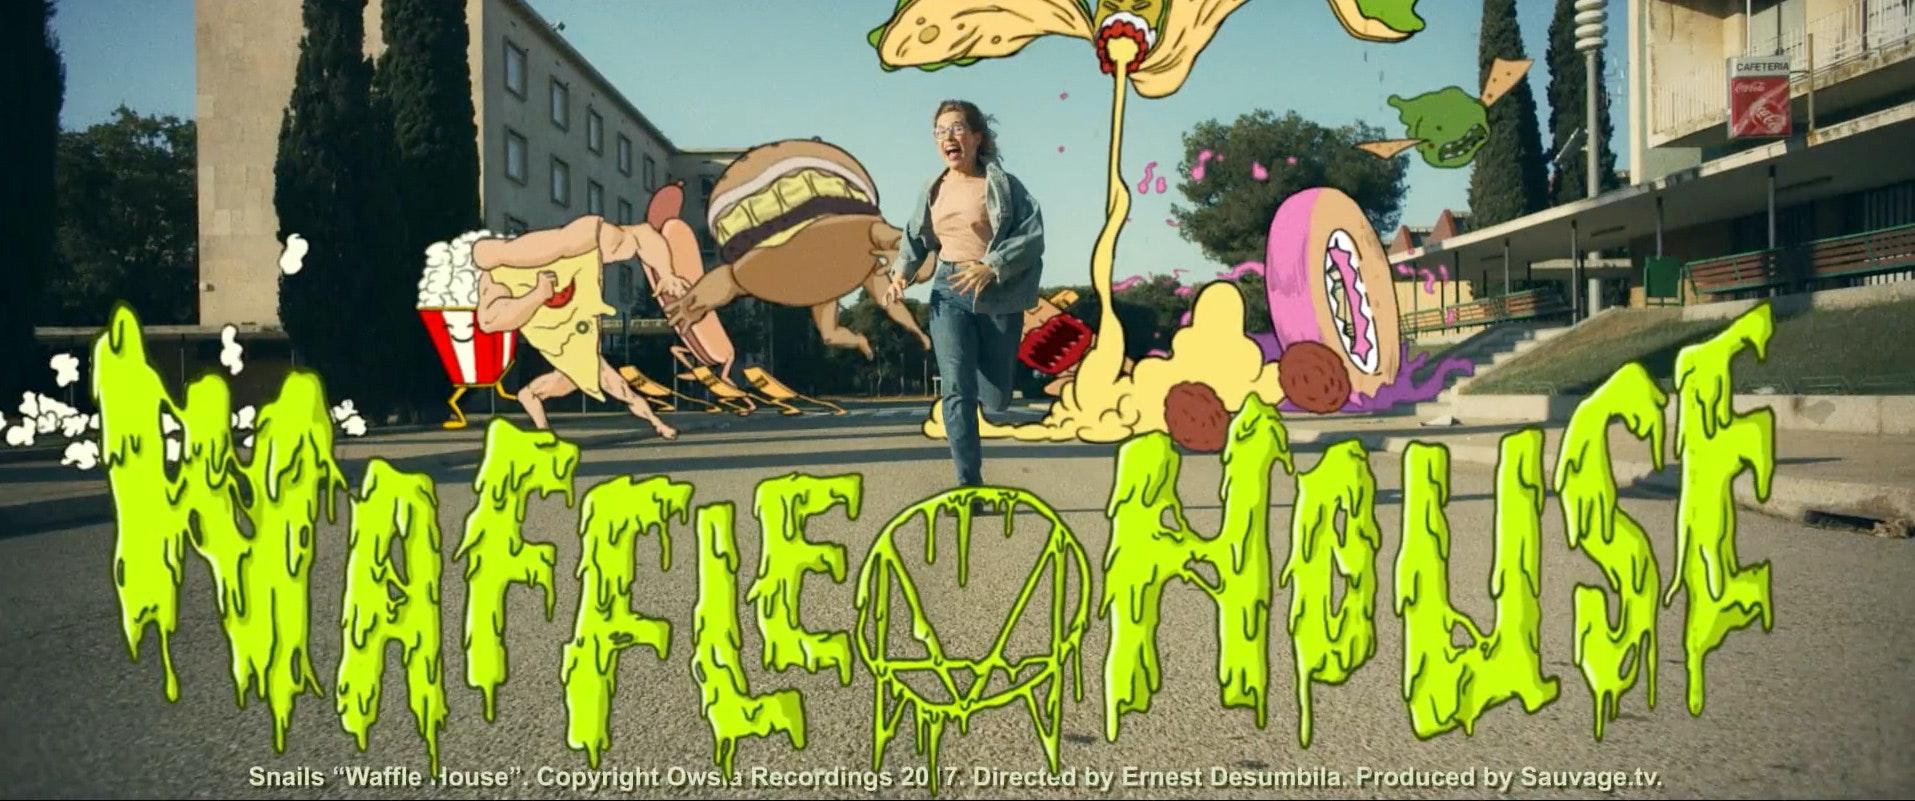 Snails - Waffle House. Edited by Lluis Murua